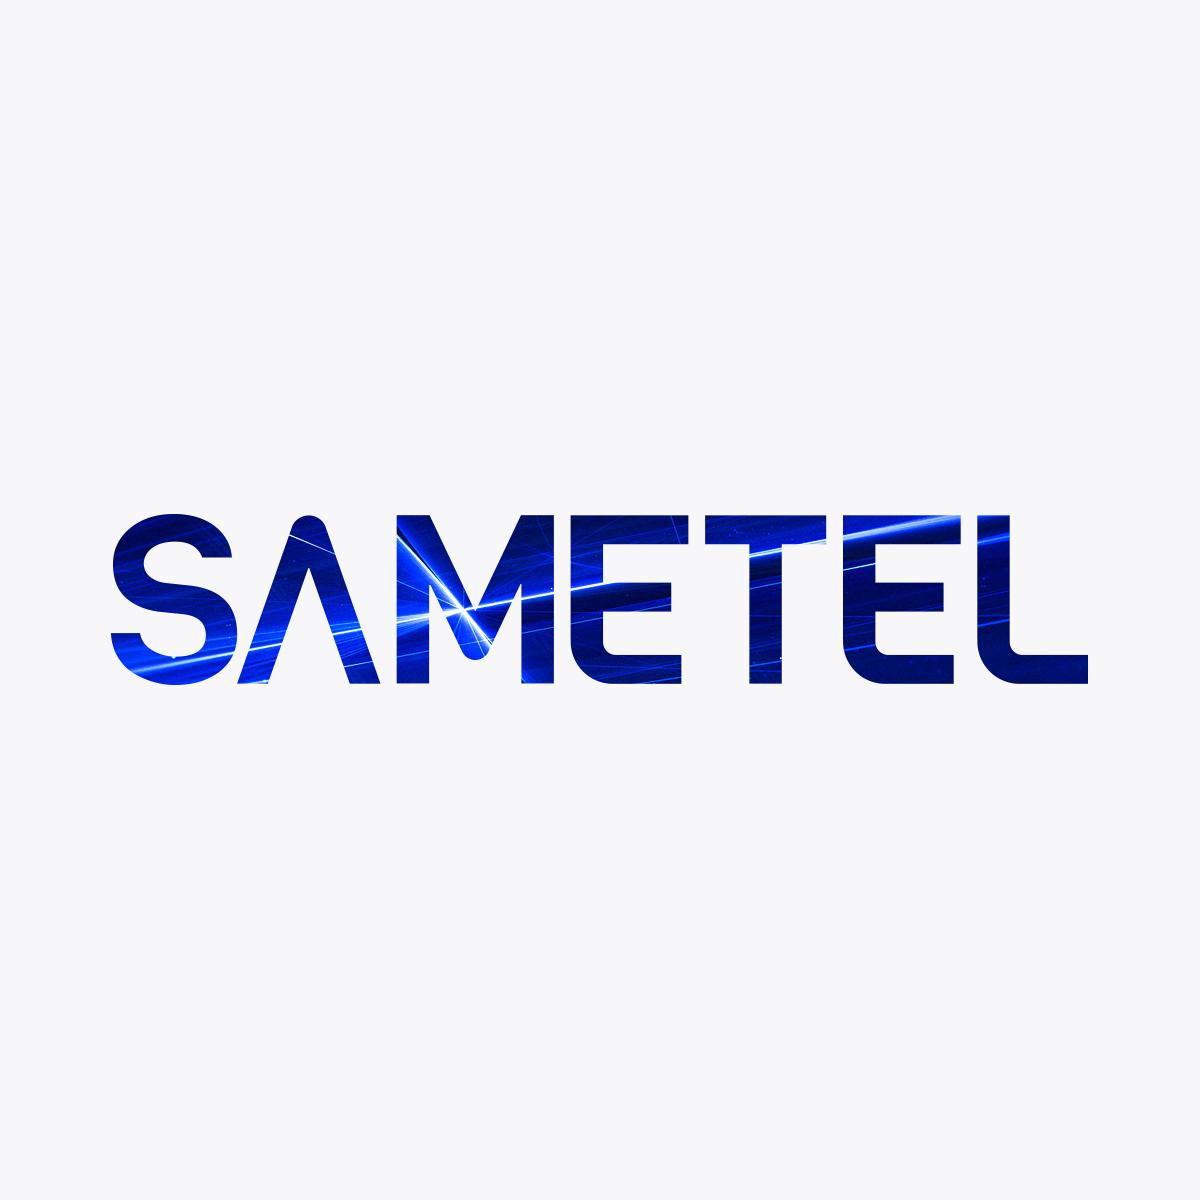 Sametel Corporation